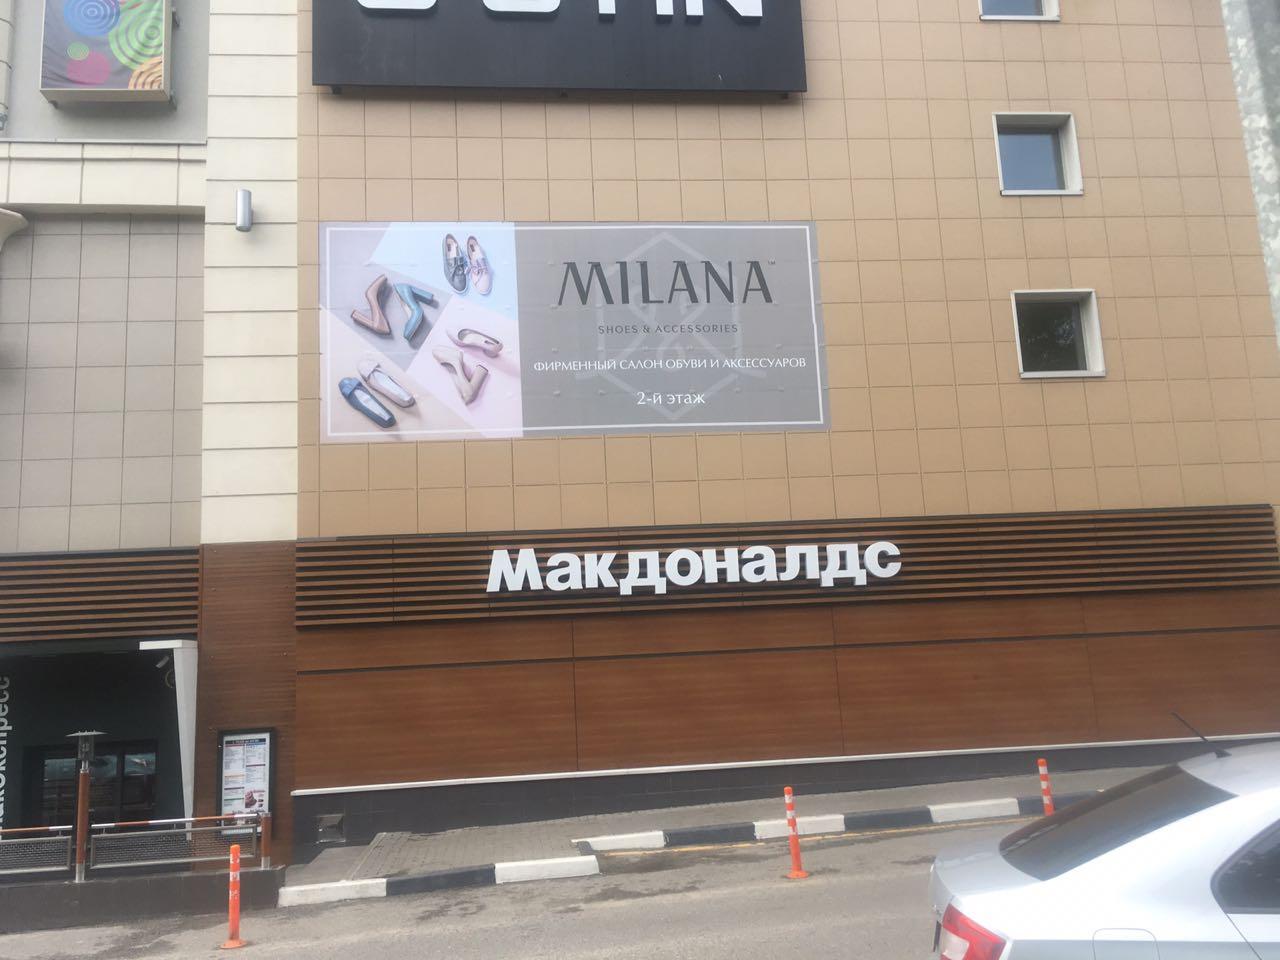 Наклейка на фасаде ТРЦ «ВЕСНА» 7000х3000мм.  Монтаж с использованием спецтехники.